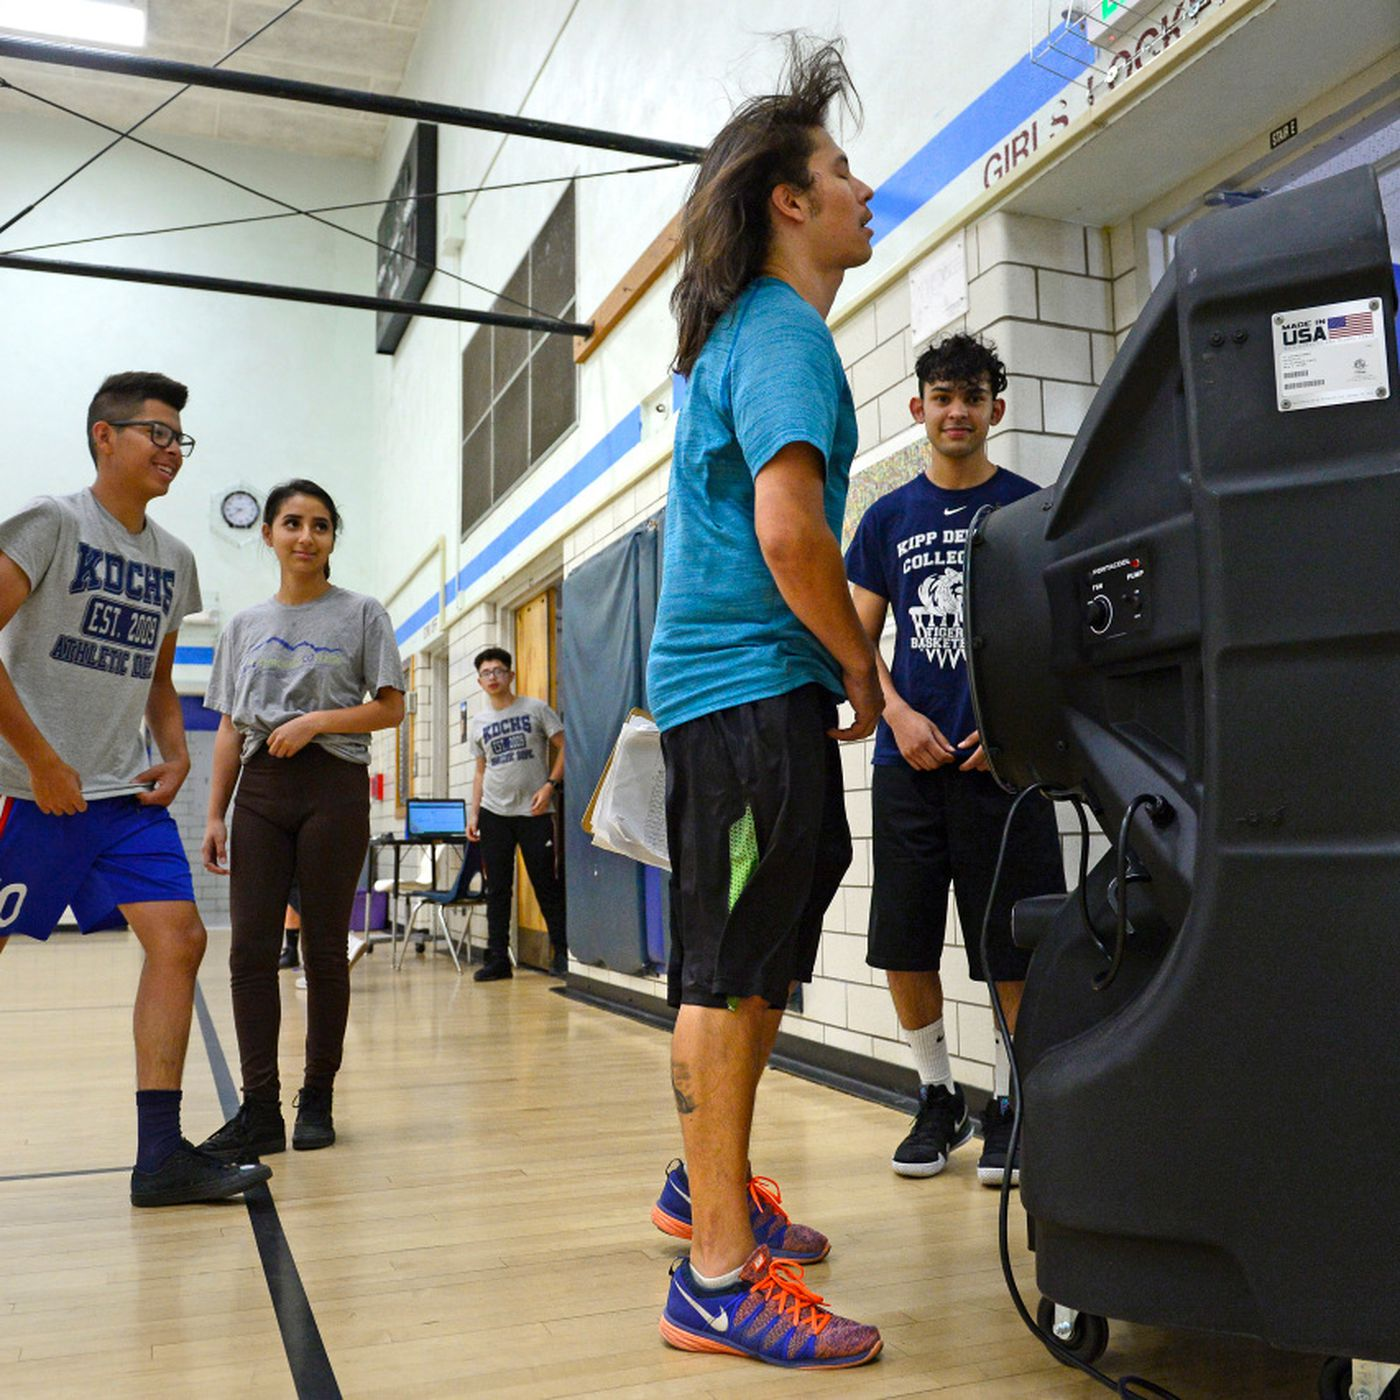 Denver Public Schools Calendar 2022 23.To Avoid Hot Classrooms Denver Pushes School Calendar Back One Week Chalkbeat Colorado